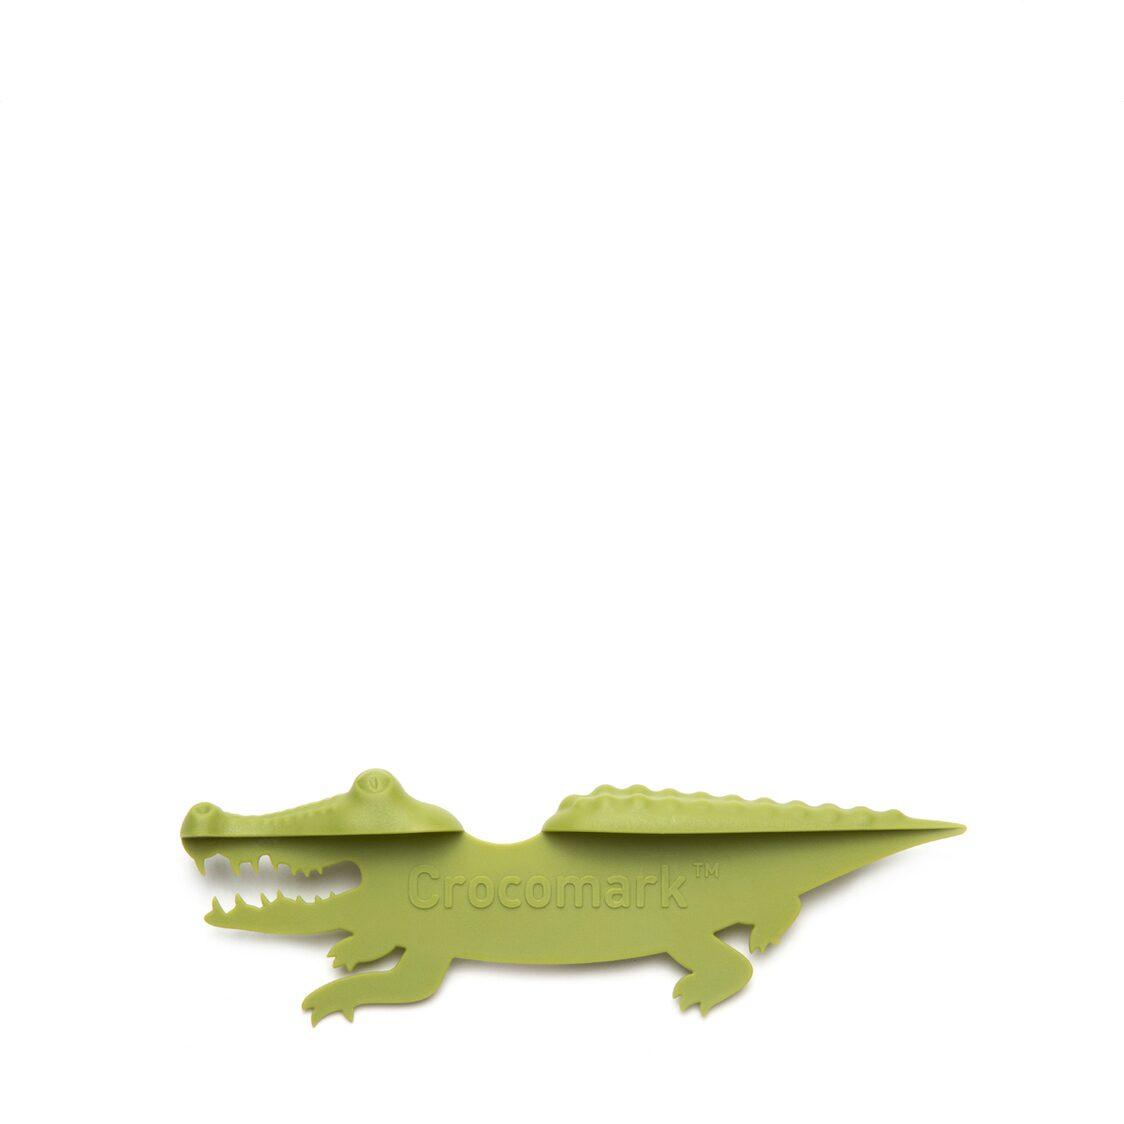 Peleg Crocomark Crocodile Bookmark